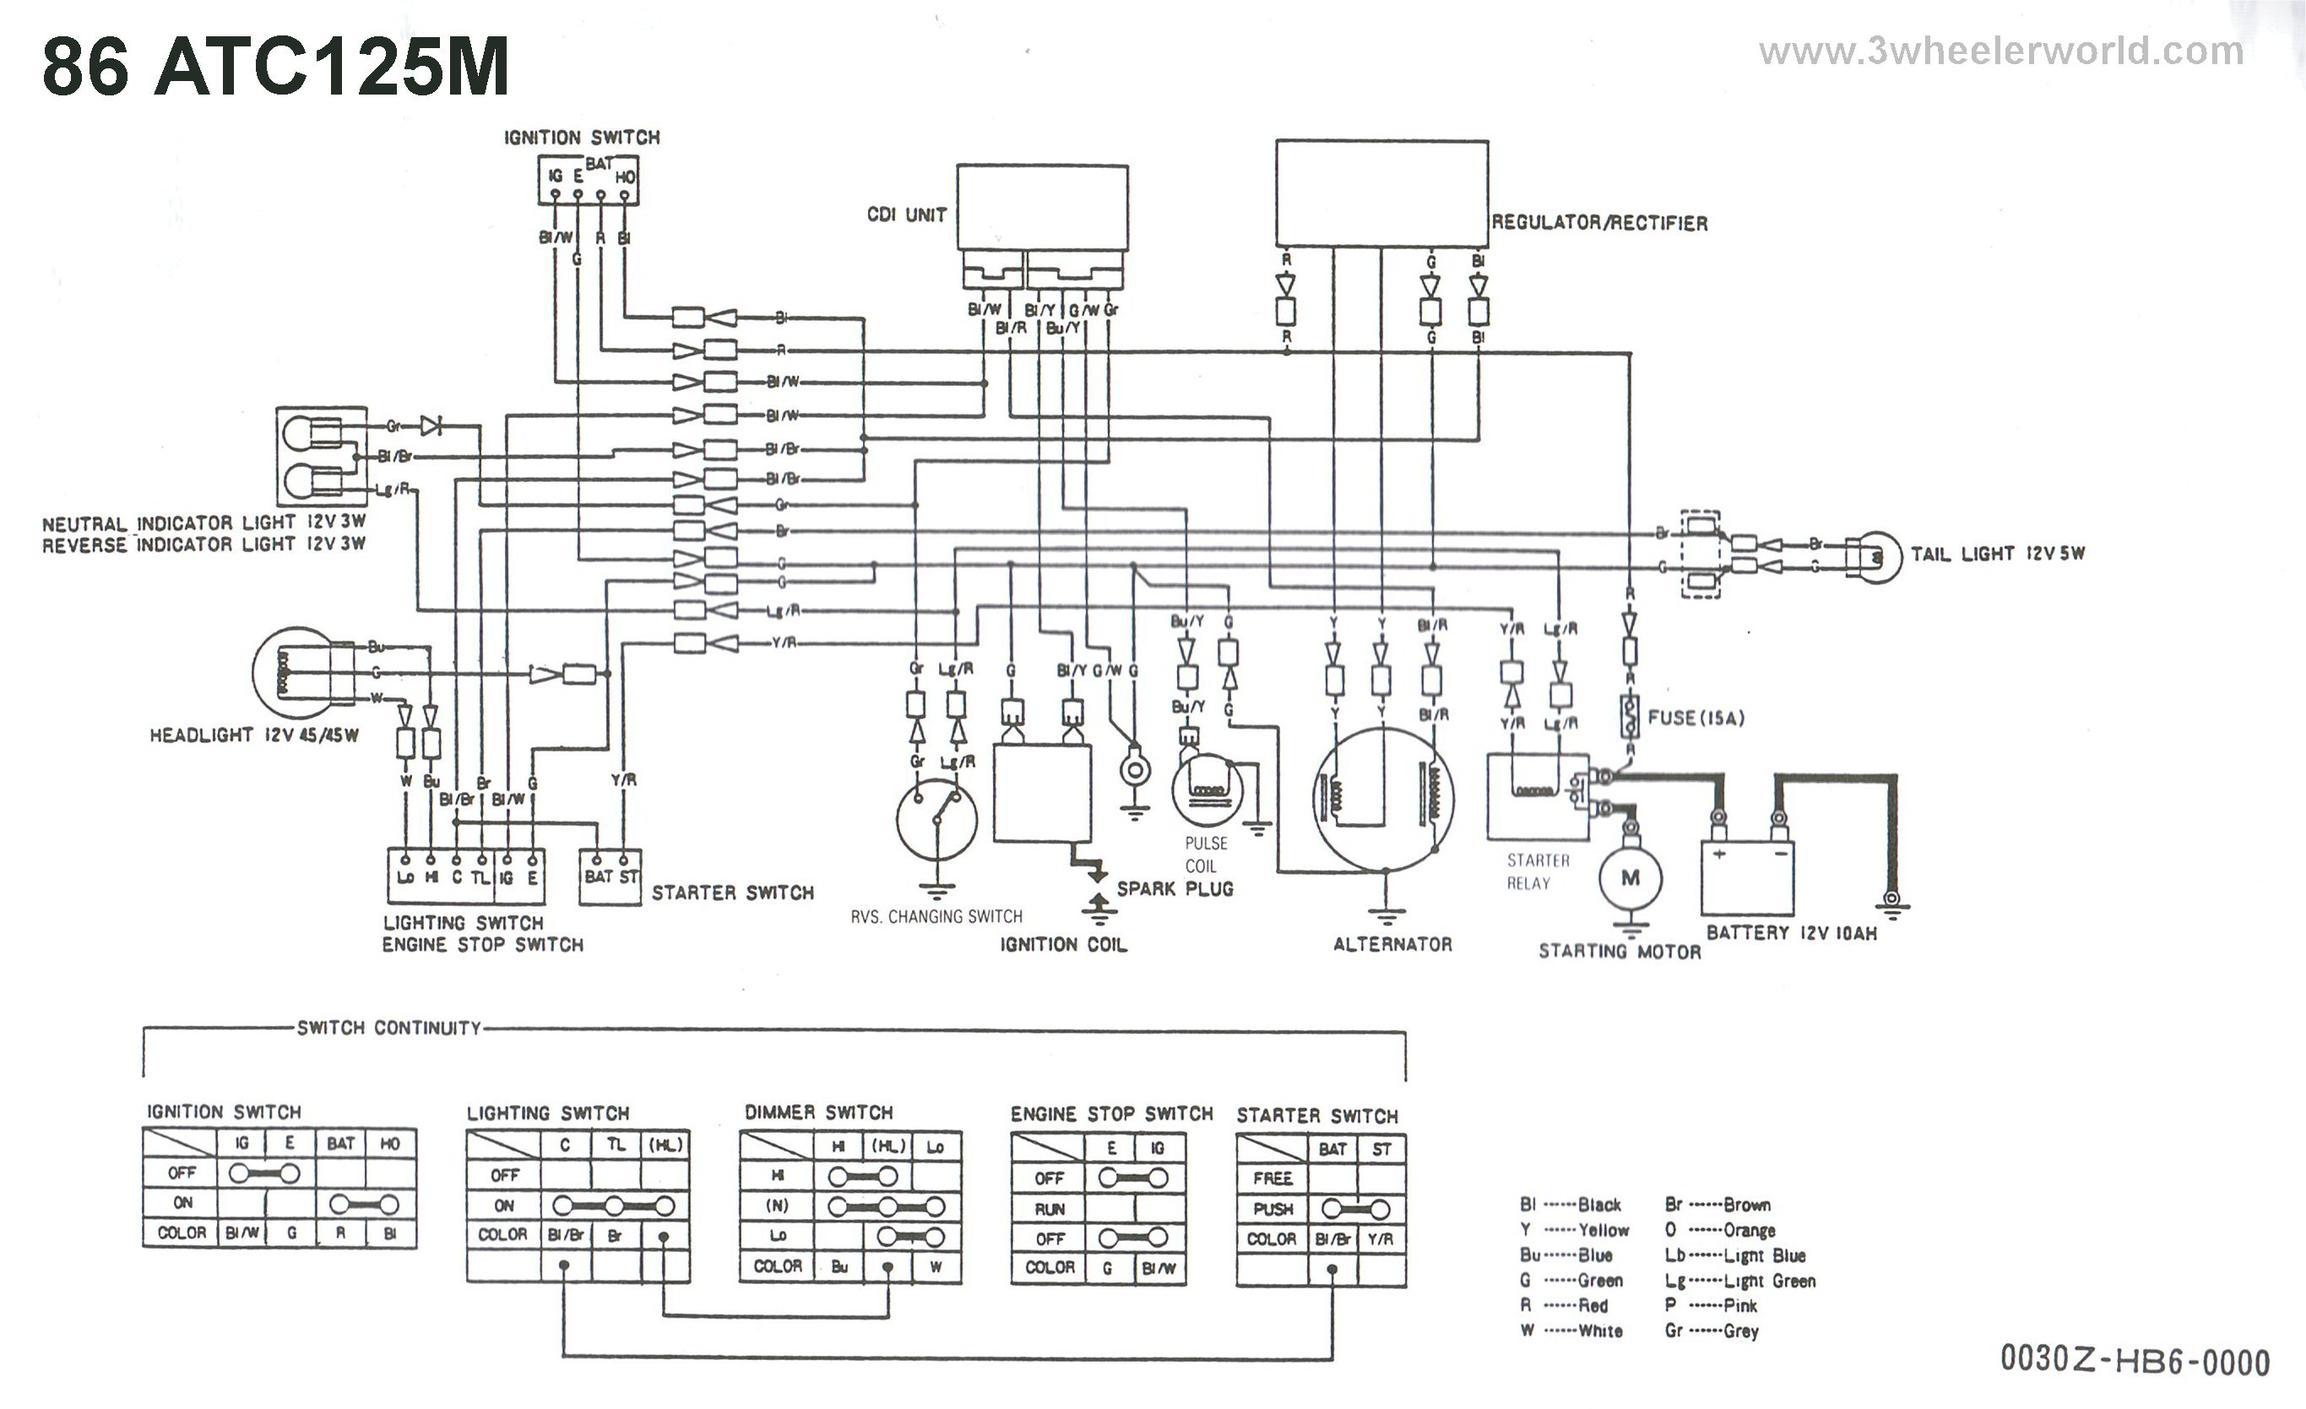 Wiring Diagram For 1984 Handa Atc 70 further 2001 Dodge Cummins Wiring Harness furthermore 1985 Honda 250sx Wiring Diagram as well Honda Atc125m Wiring Diagram likewise Zongshen Atv Wiring Diagram. on atc 125m wiring diagram